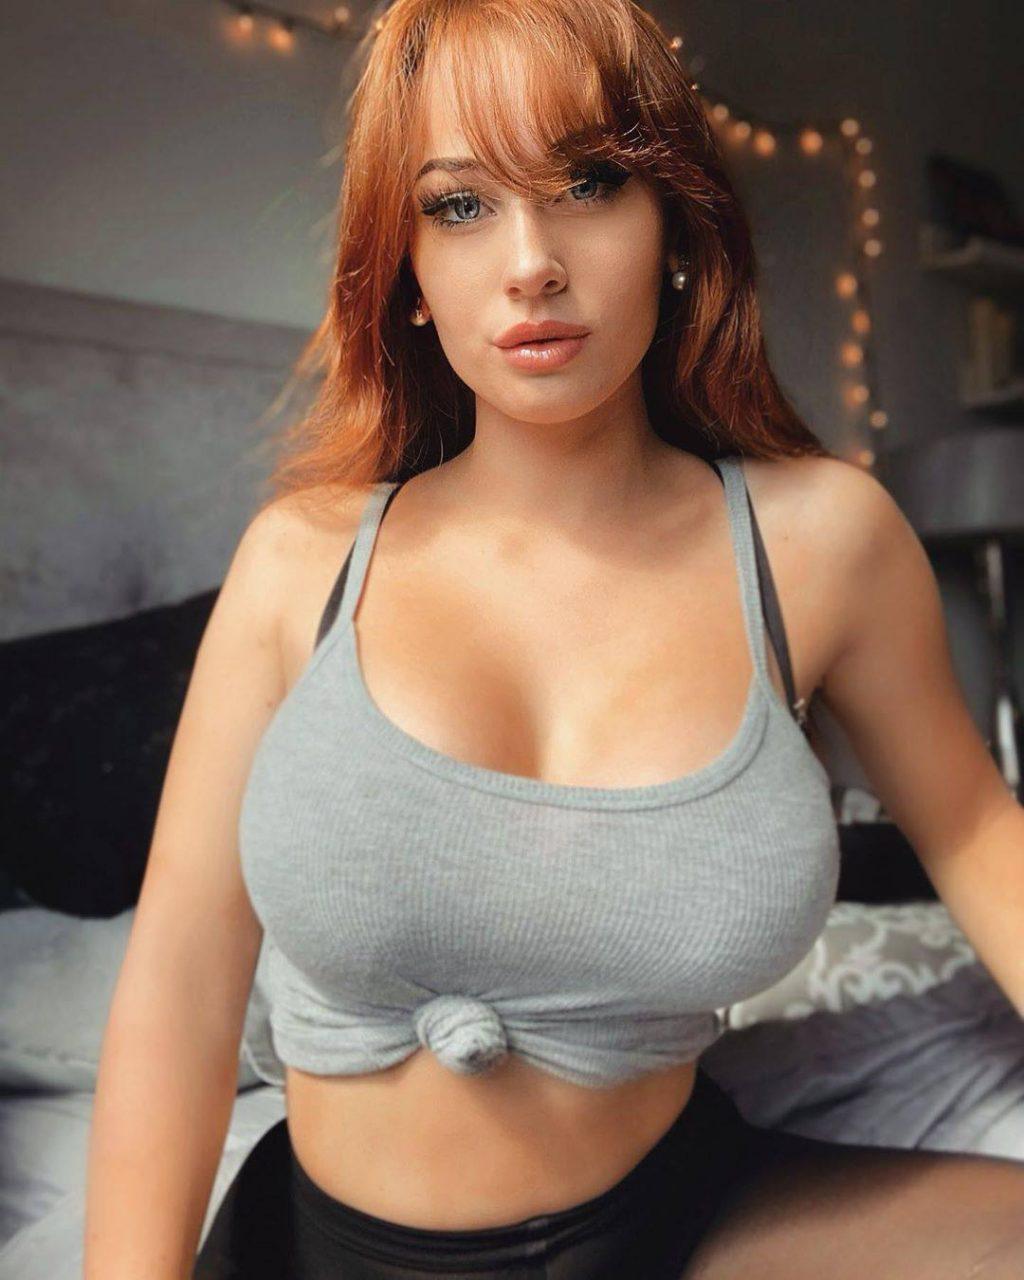 Sarah Gibson Sexy (31 Photos)